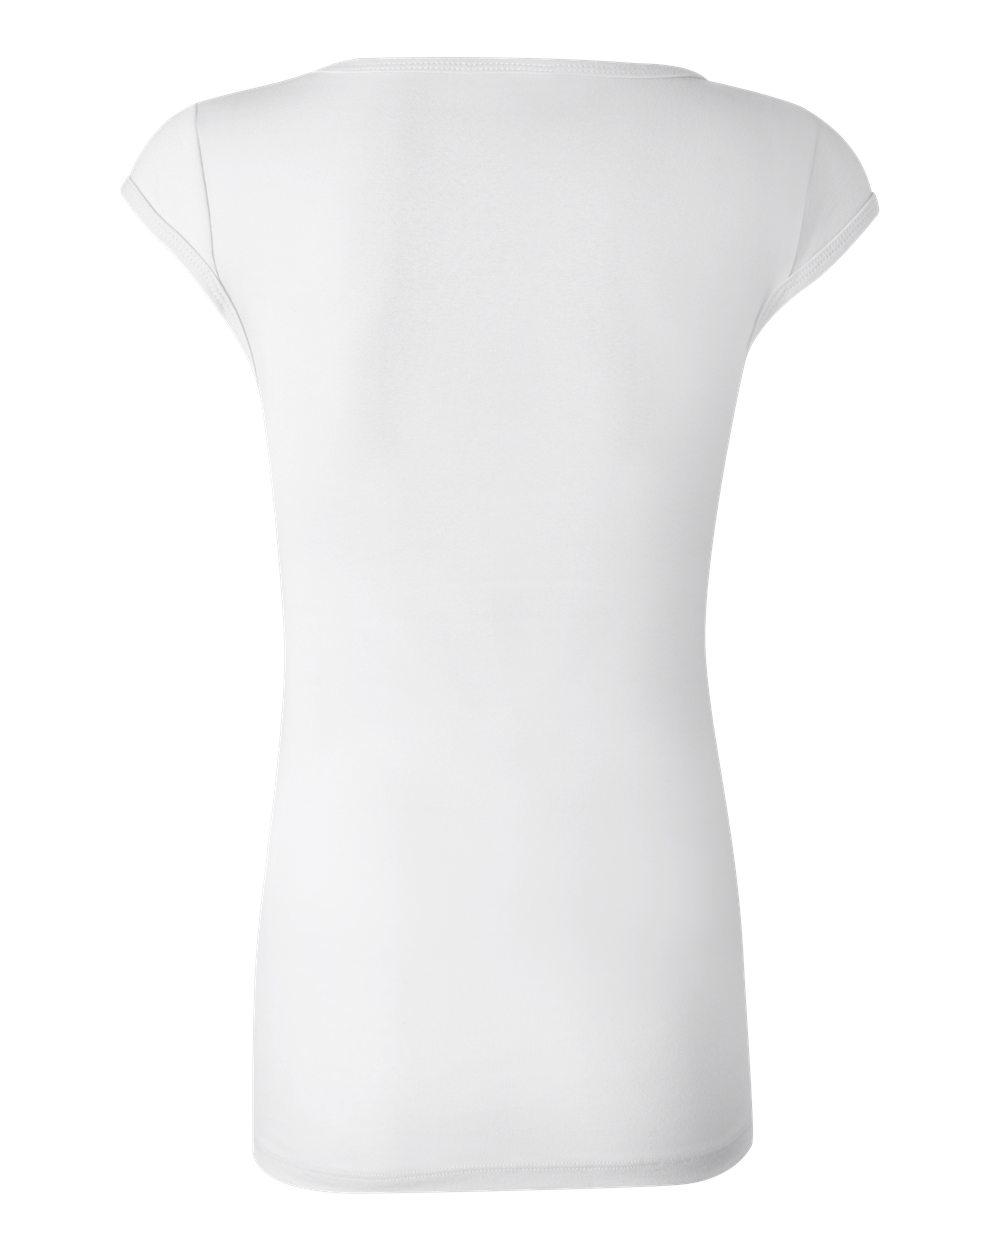 Bella-Canvas-Women-039-s-Sheer-Mini-Rib-Cap-Sleeve-Deep-V-Neck-T-Shirt-B8705-S-2XL thumbnail 4